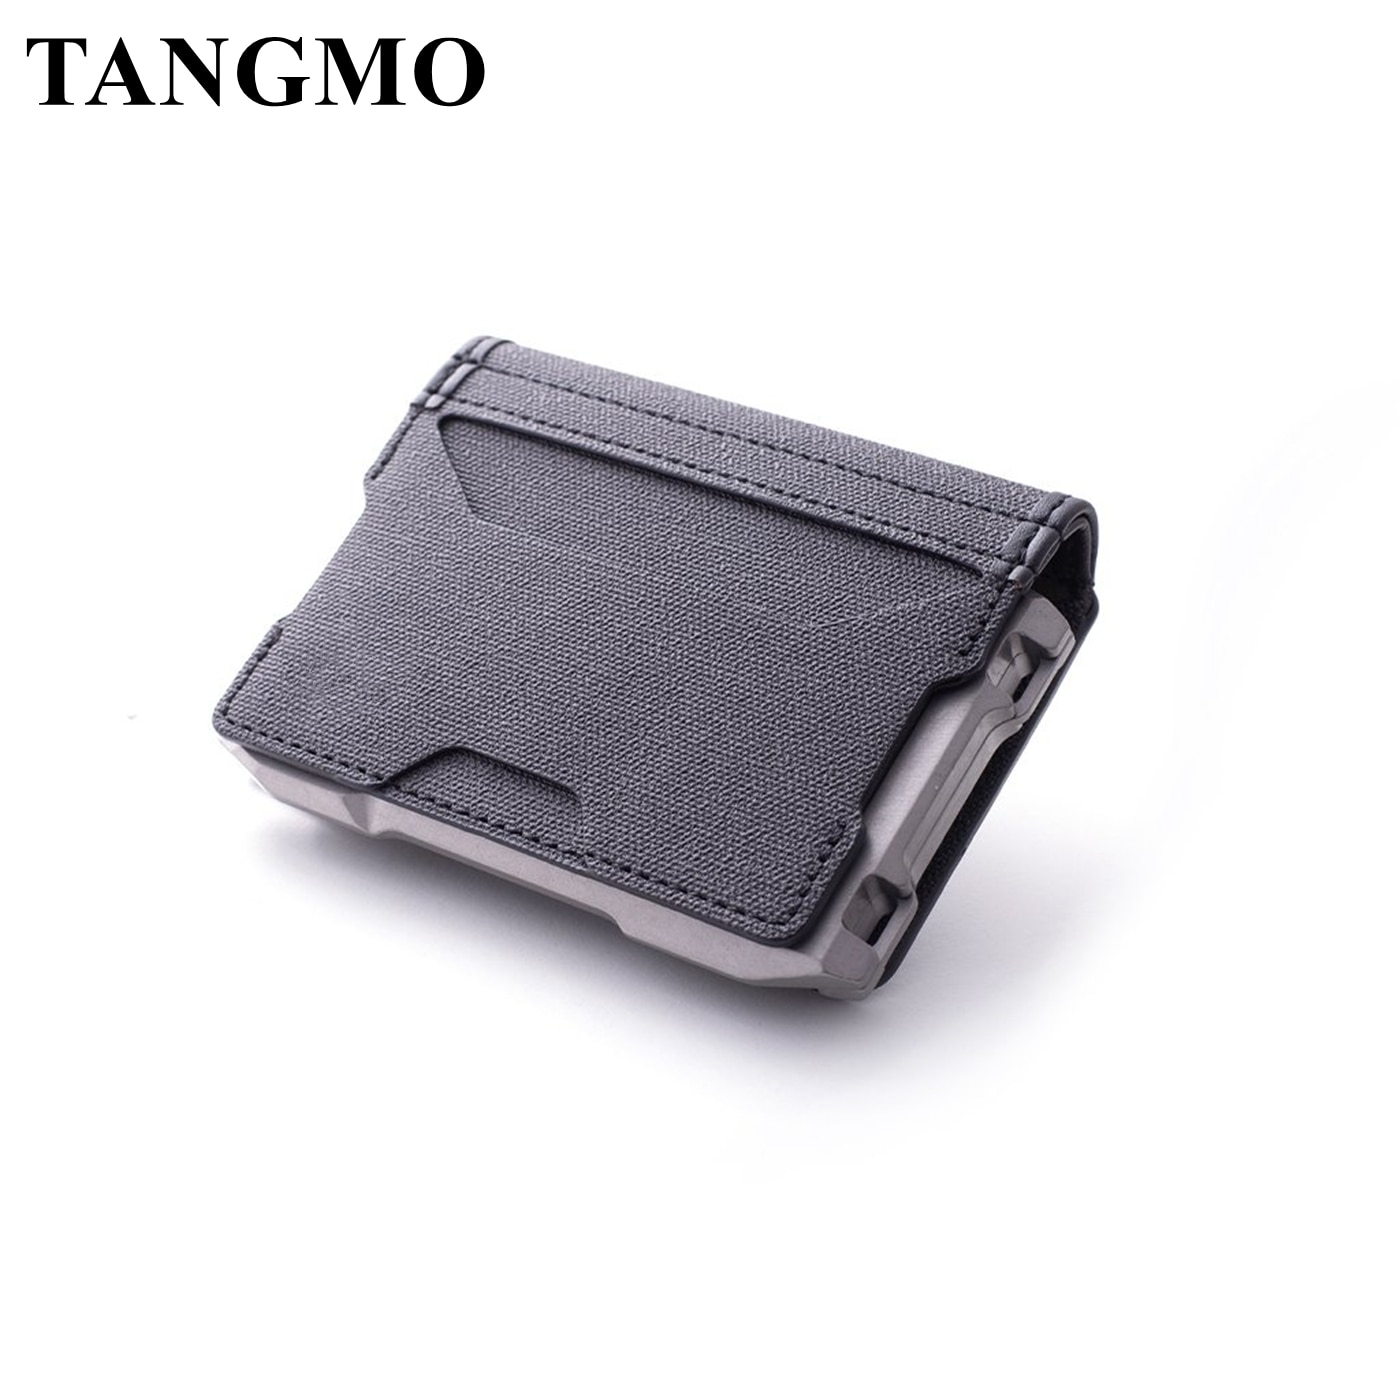 Tangmo 2021メンズ財布二つ折りアルミニウム金属rfidクレジットカードホルダー銀行idカード会員カードケース実用的な戦術的なバッグ